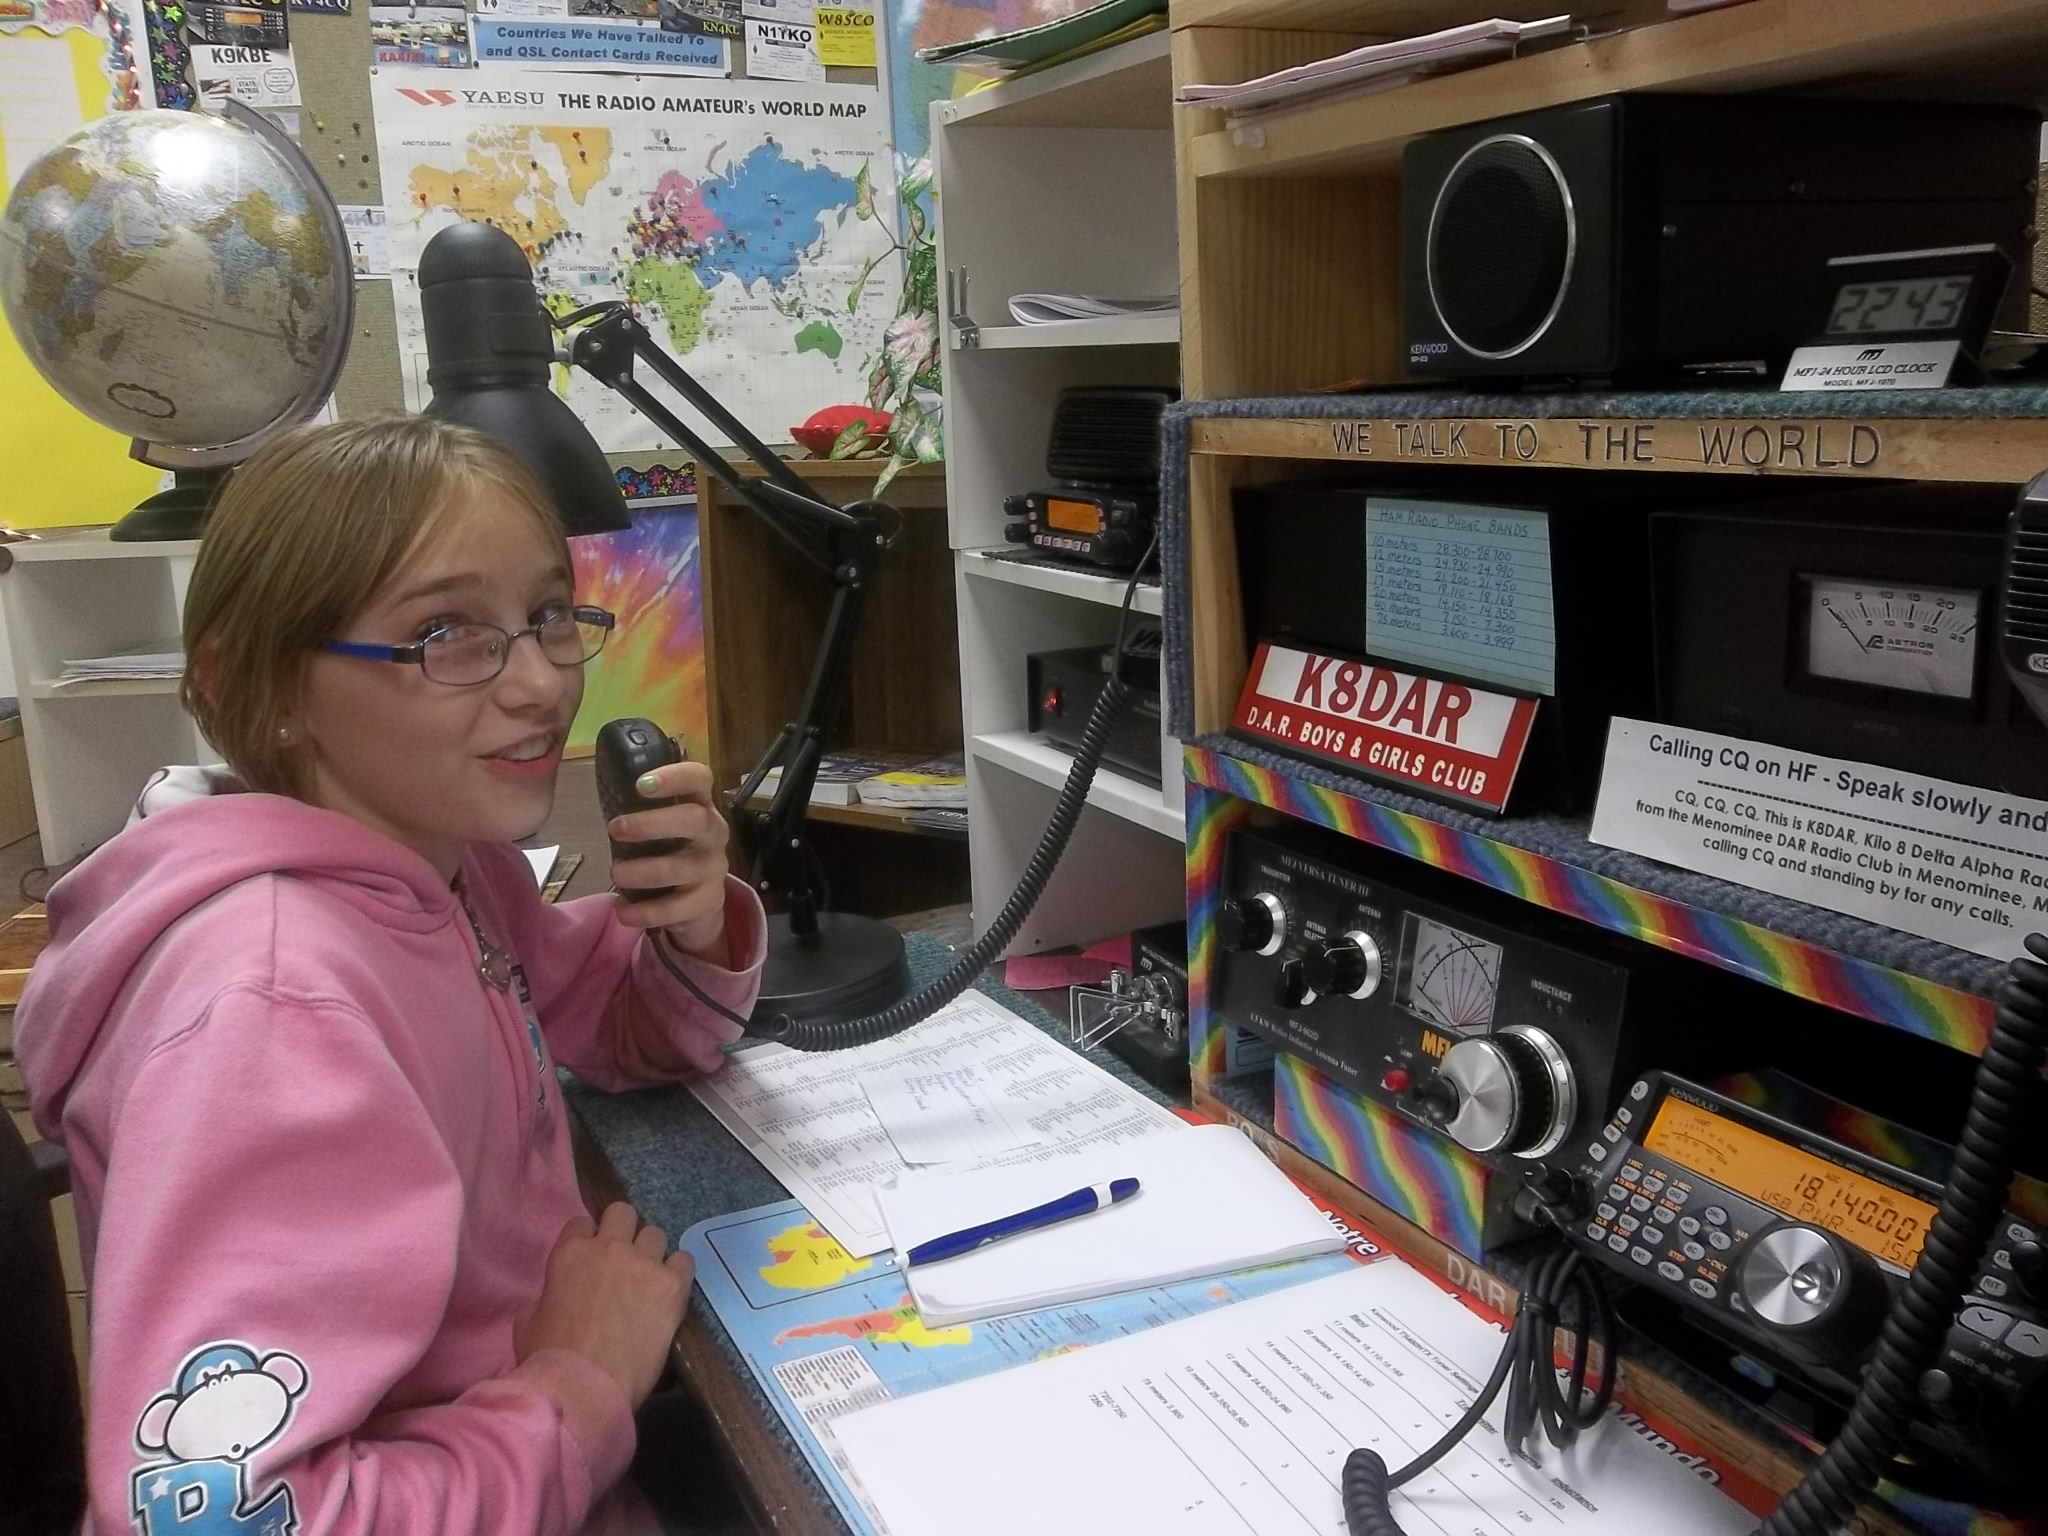 Amature radio sites